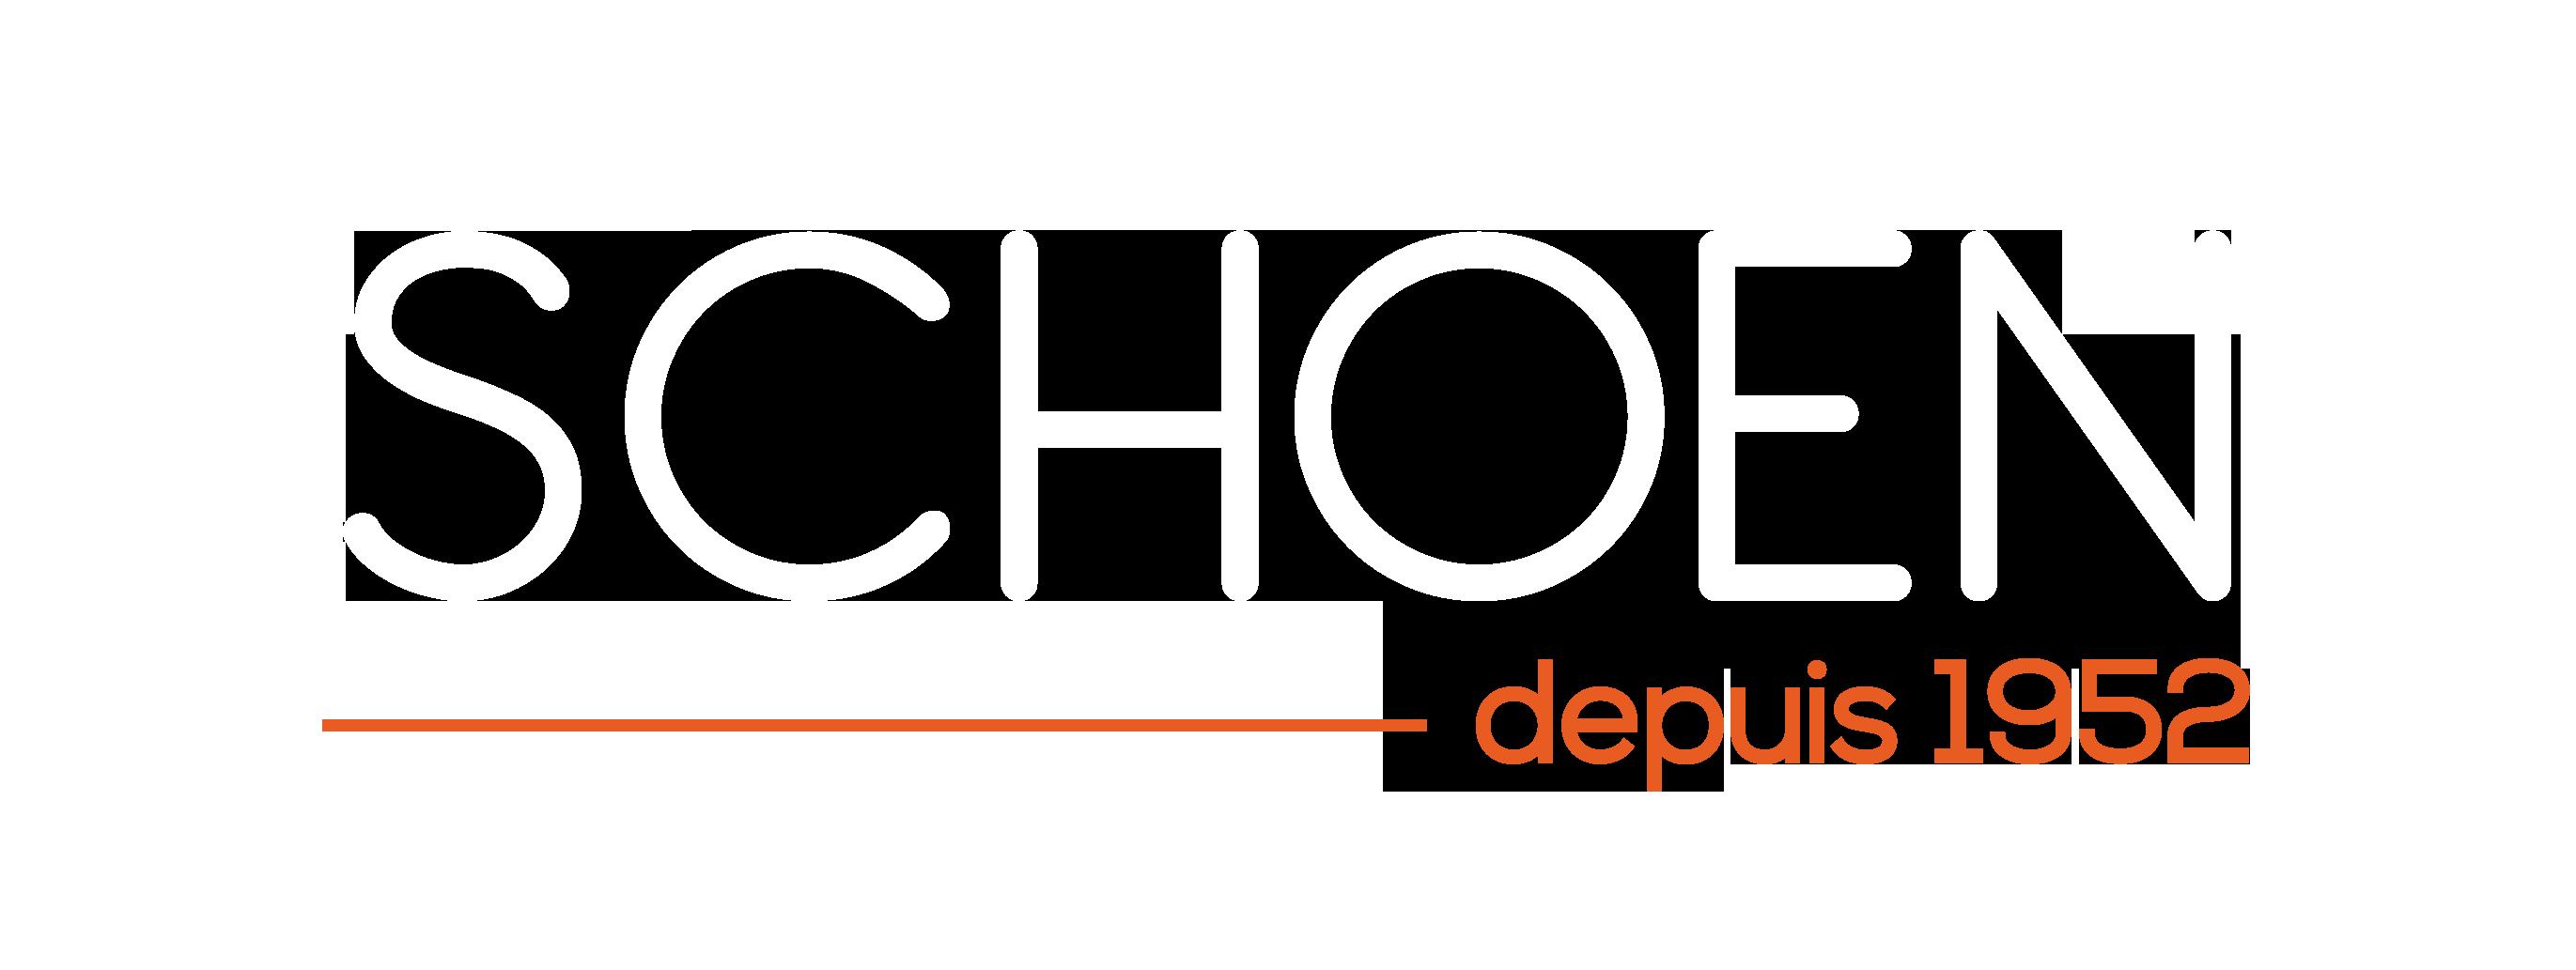 https://schoen1952.fr/wp-content/uploads/2019/02/logo_schoen_new_blanc_orange.png